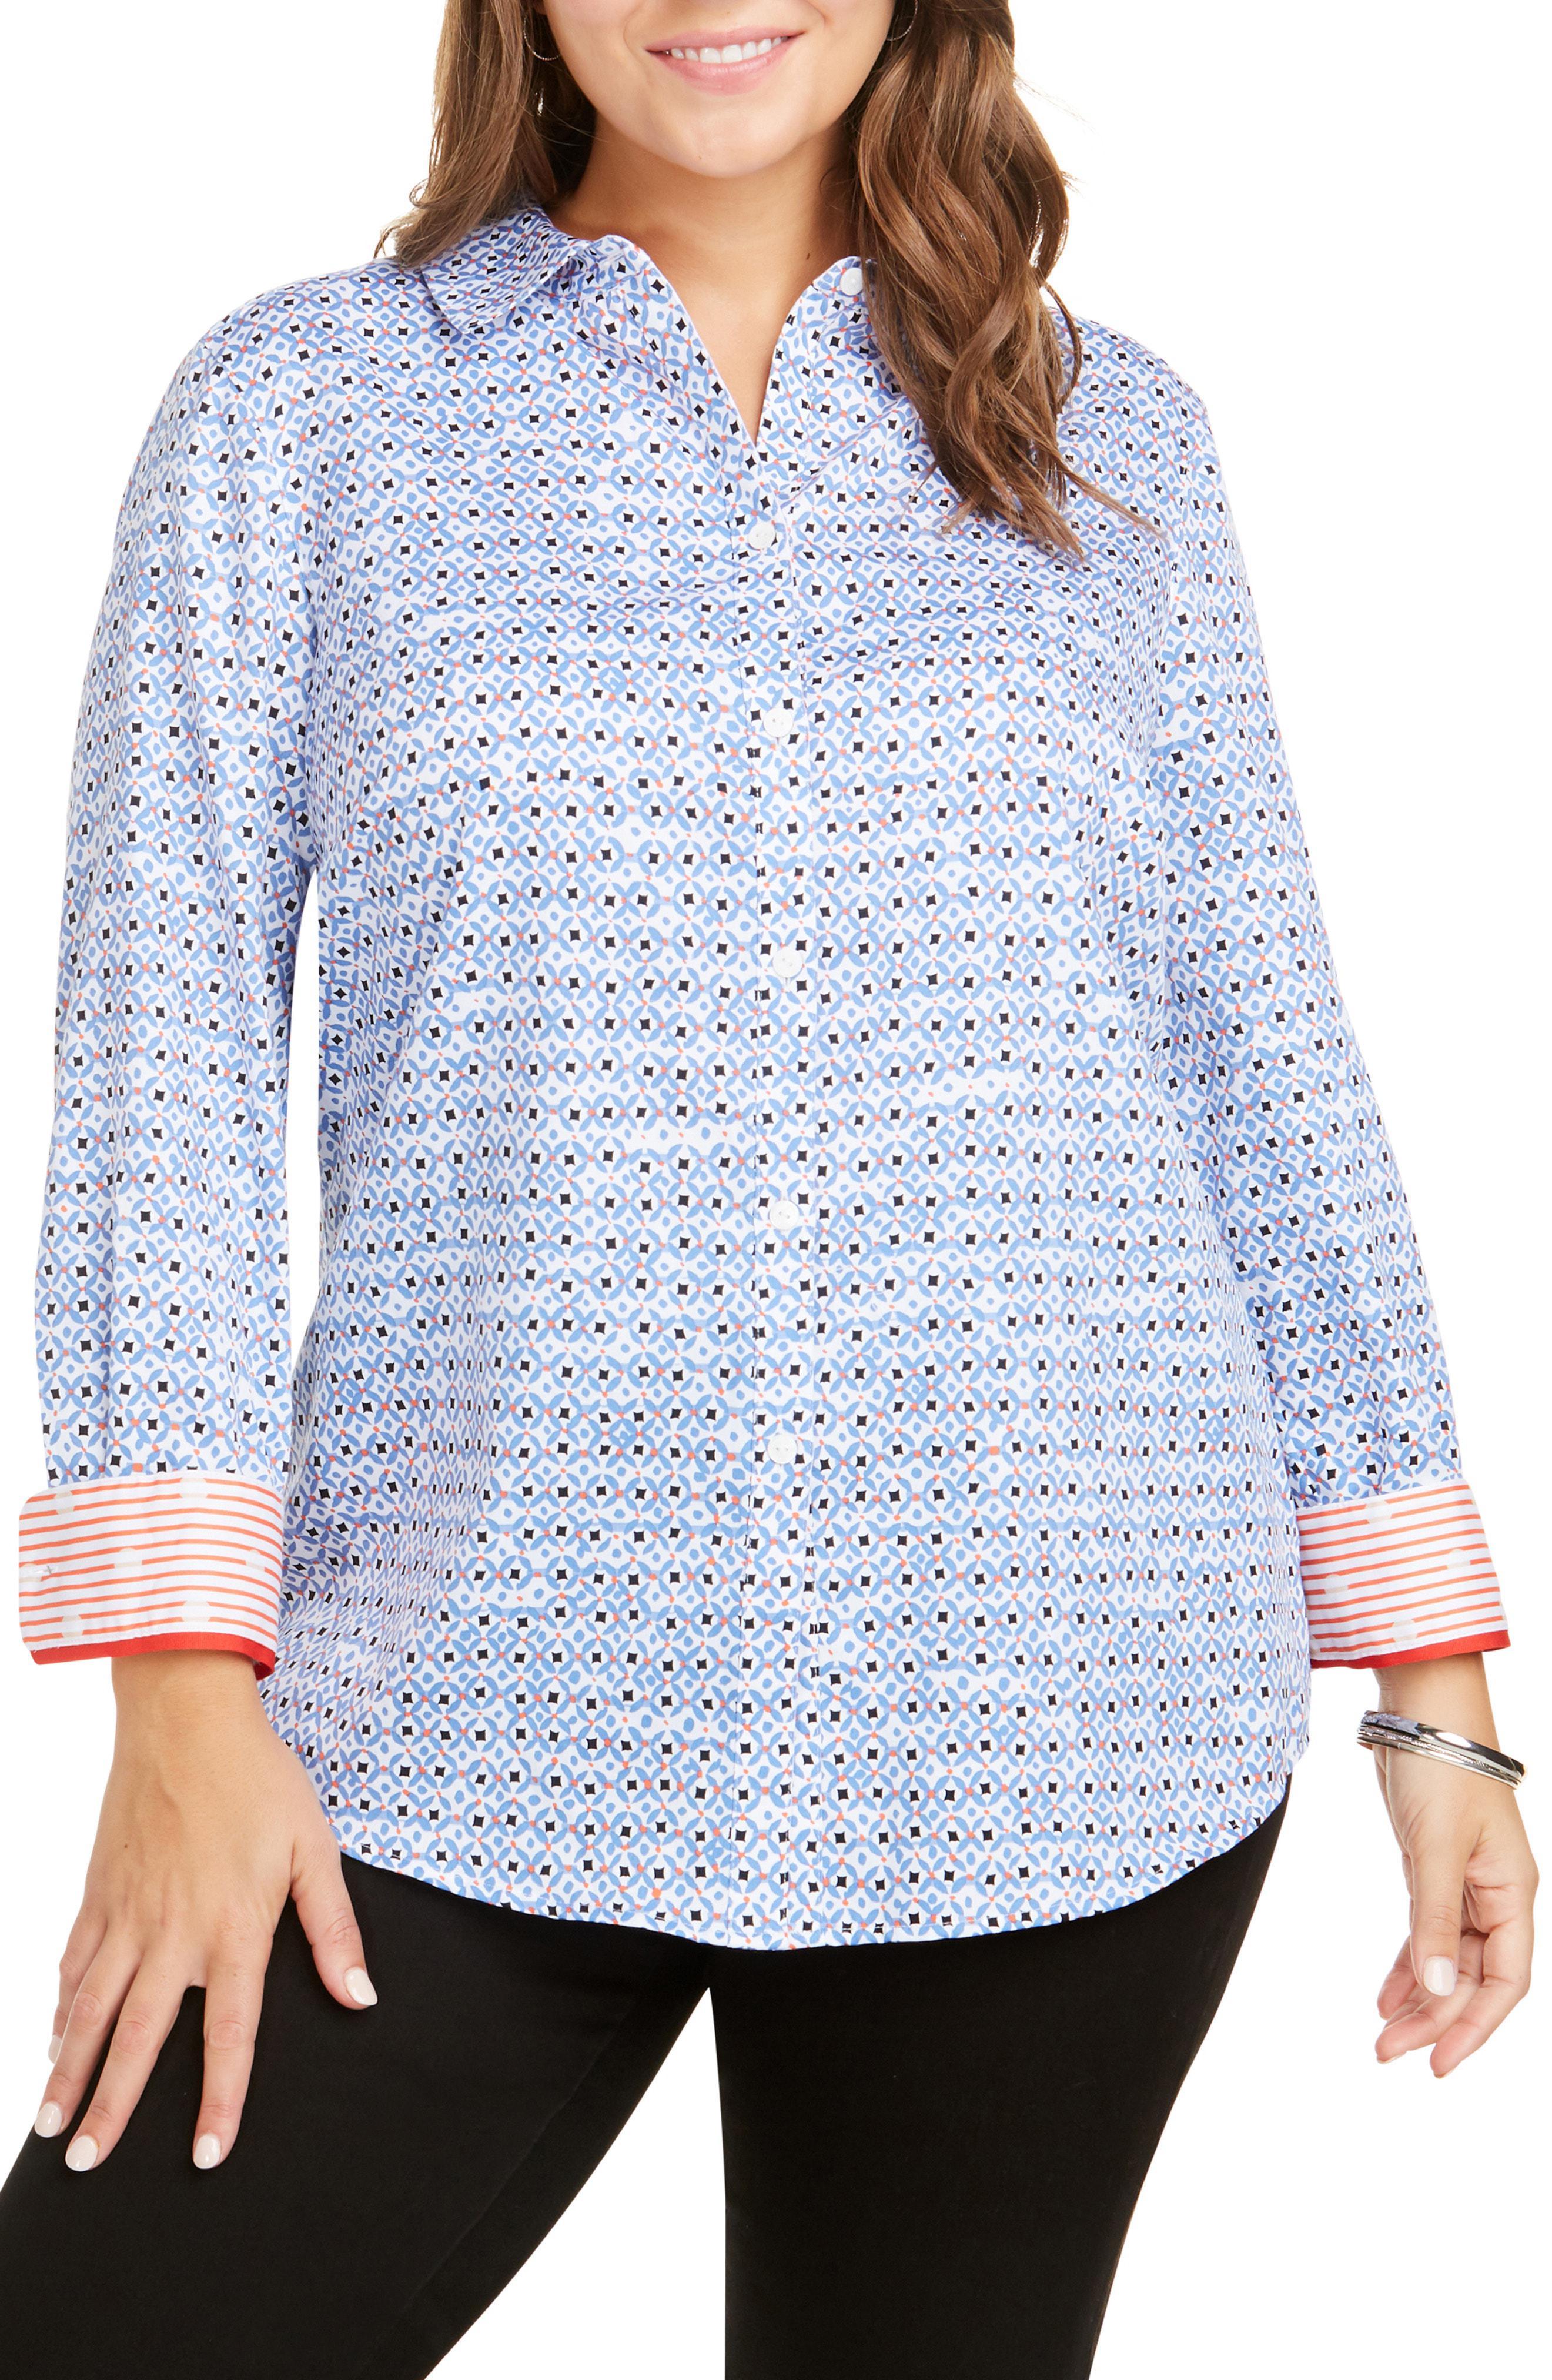 c85cea547e73d Foxcroft. Women s Blue Ava Wrinkle Free Diamond Status Print Cotton Shirt